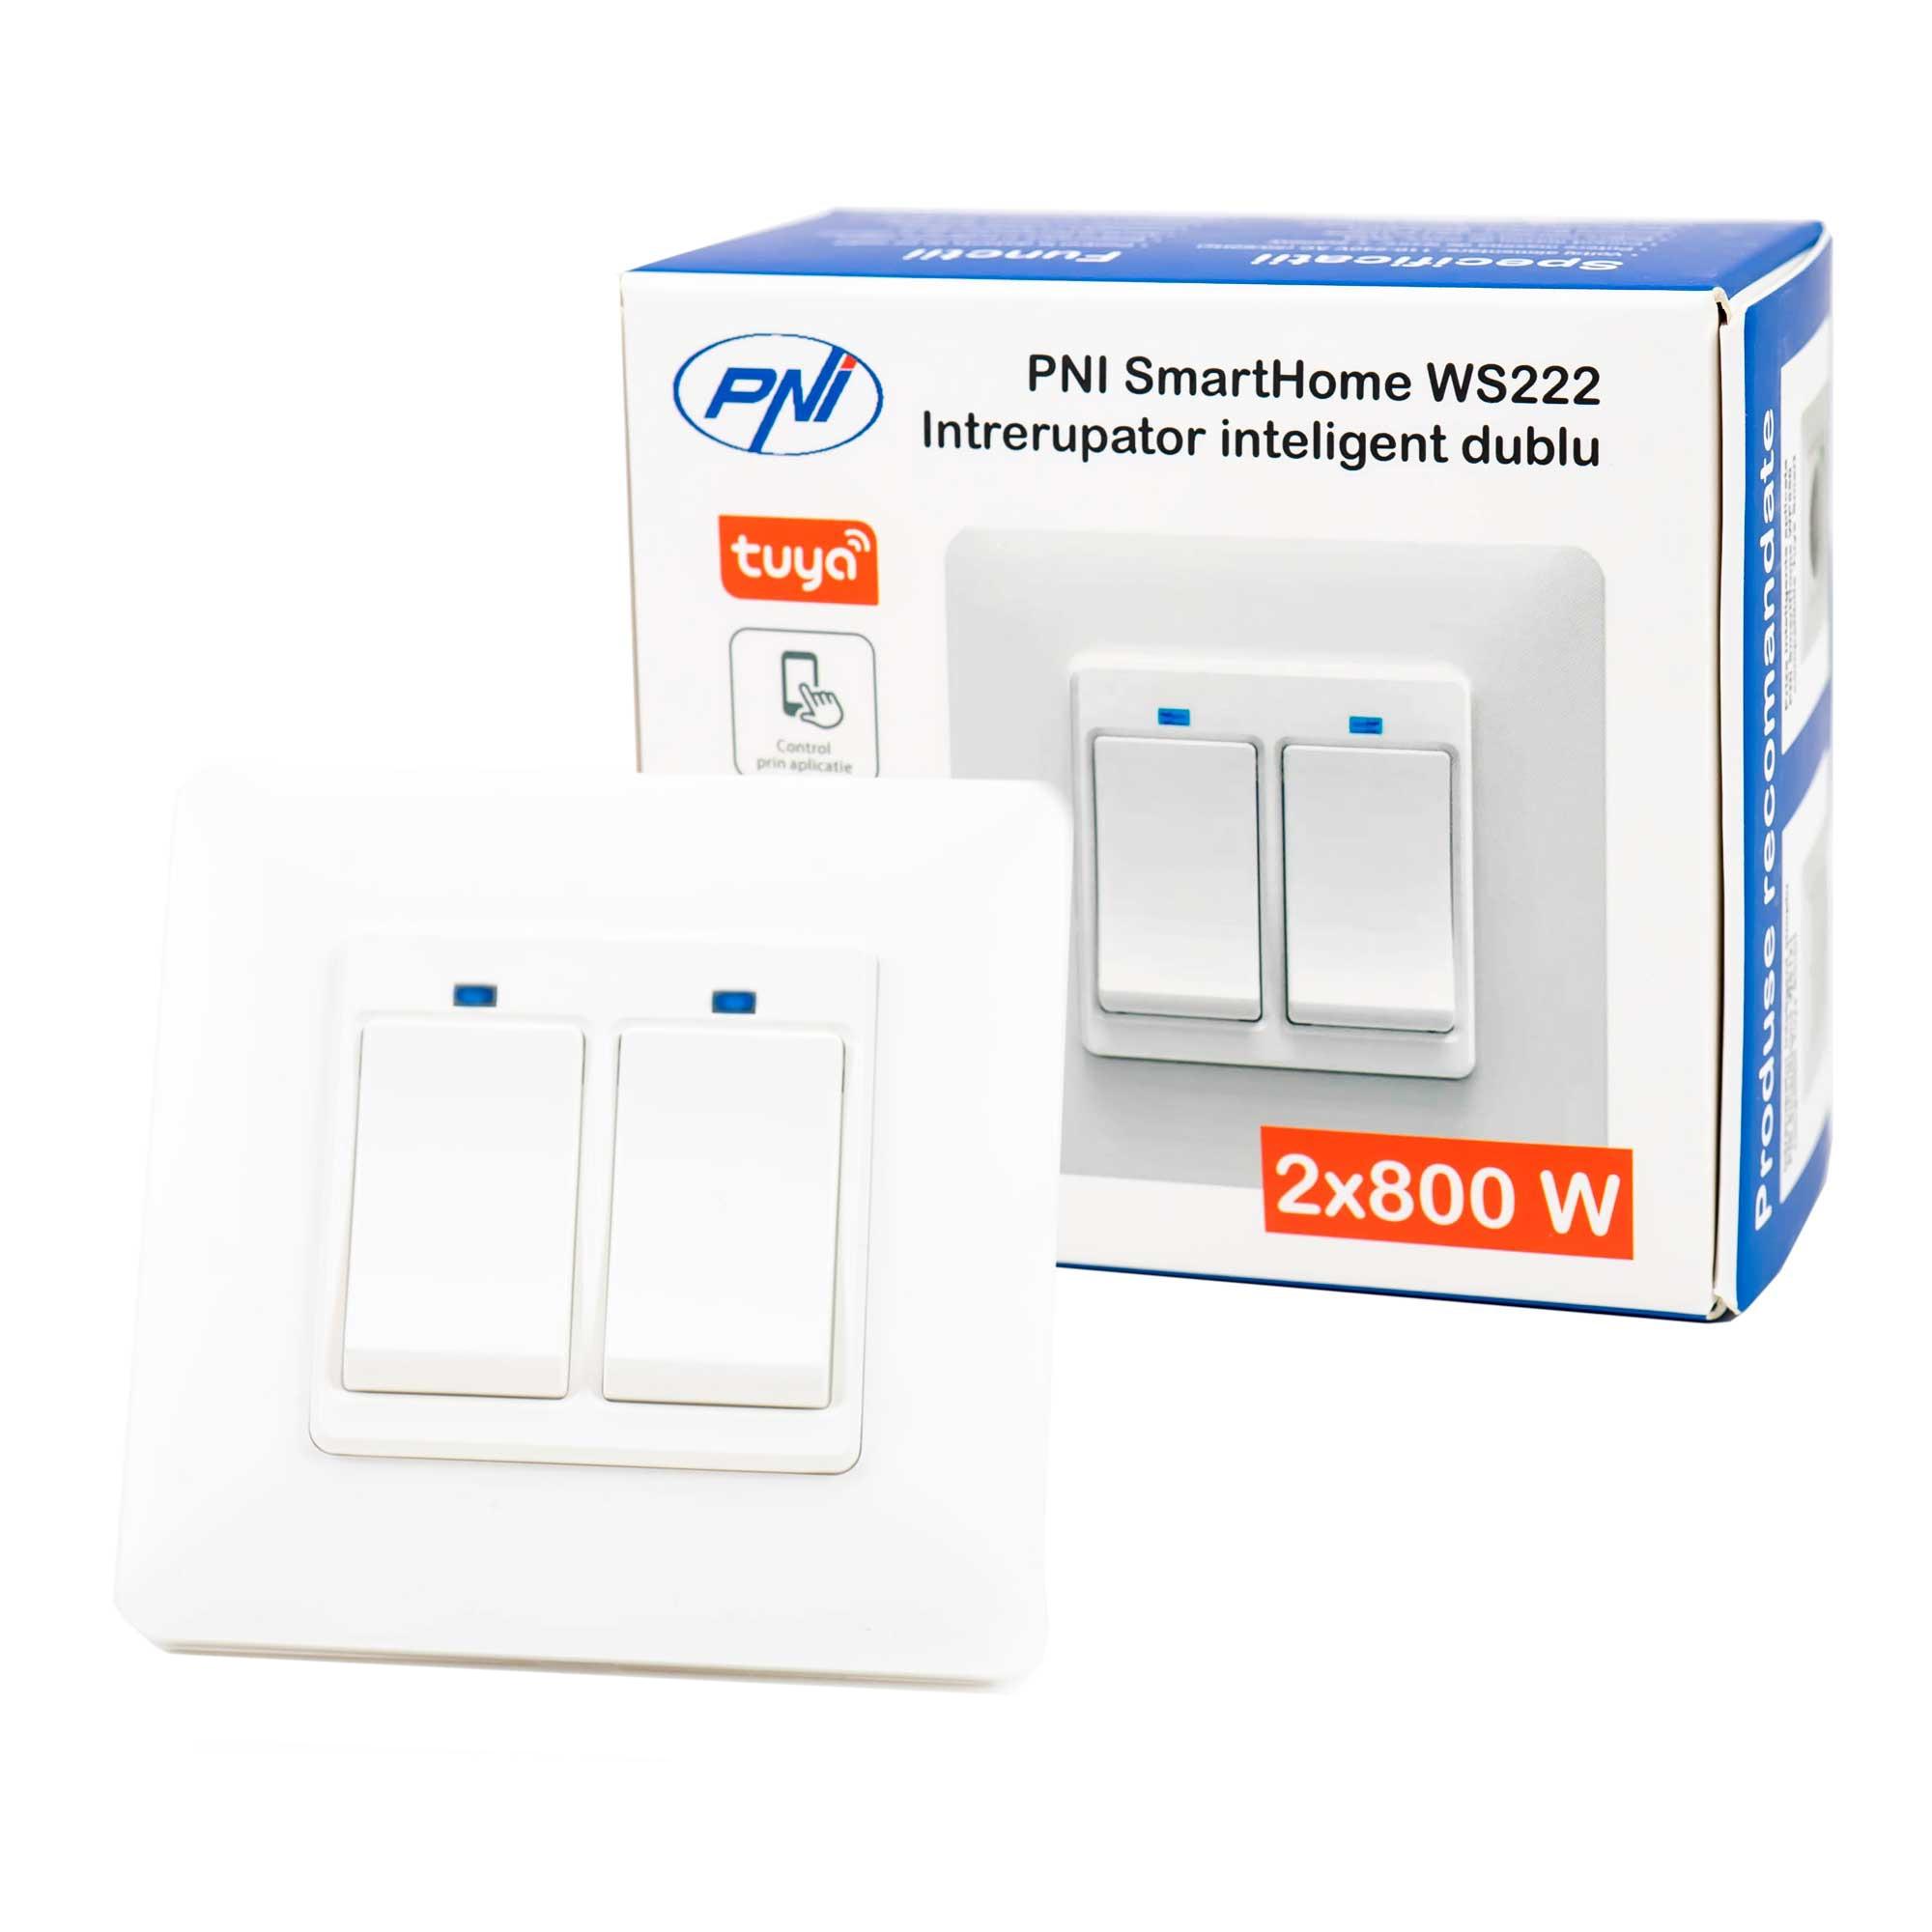 Fotografie Intrerupator inteligent dublu PNI SmartHome WS222, Wi-Fi, 2x800W, cu revenire, App Tuya Smart, compatibil Amazon Alexa/Google Home, Alb